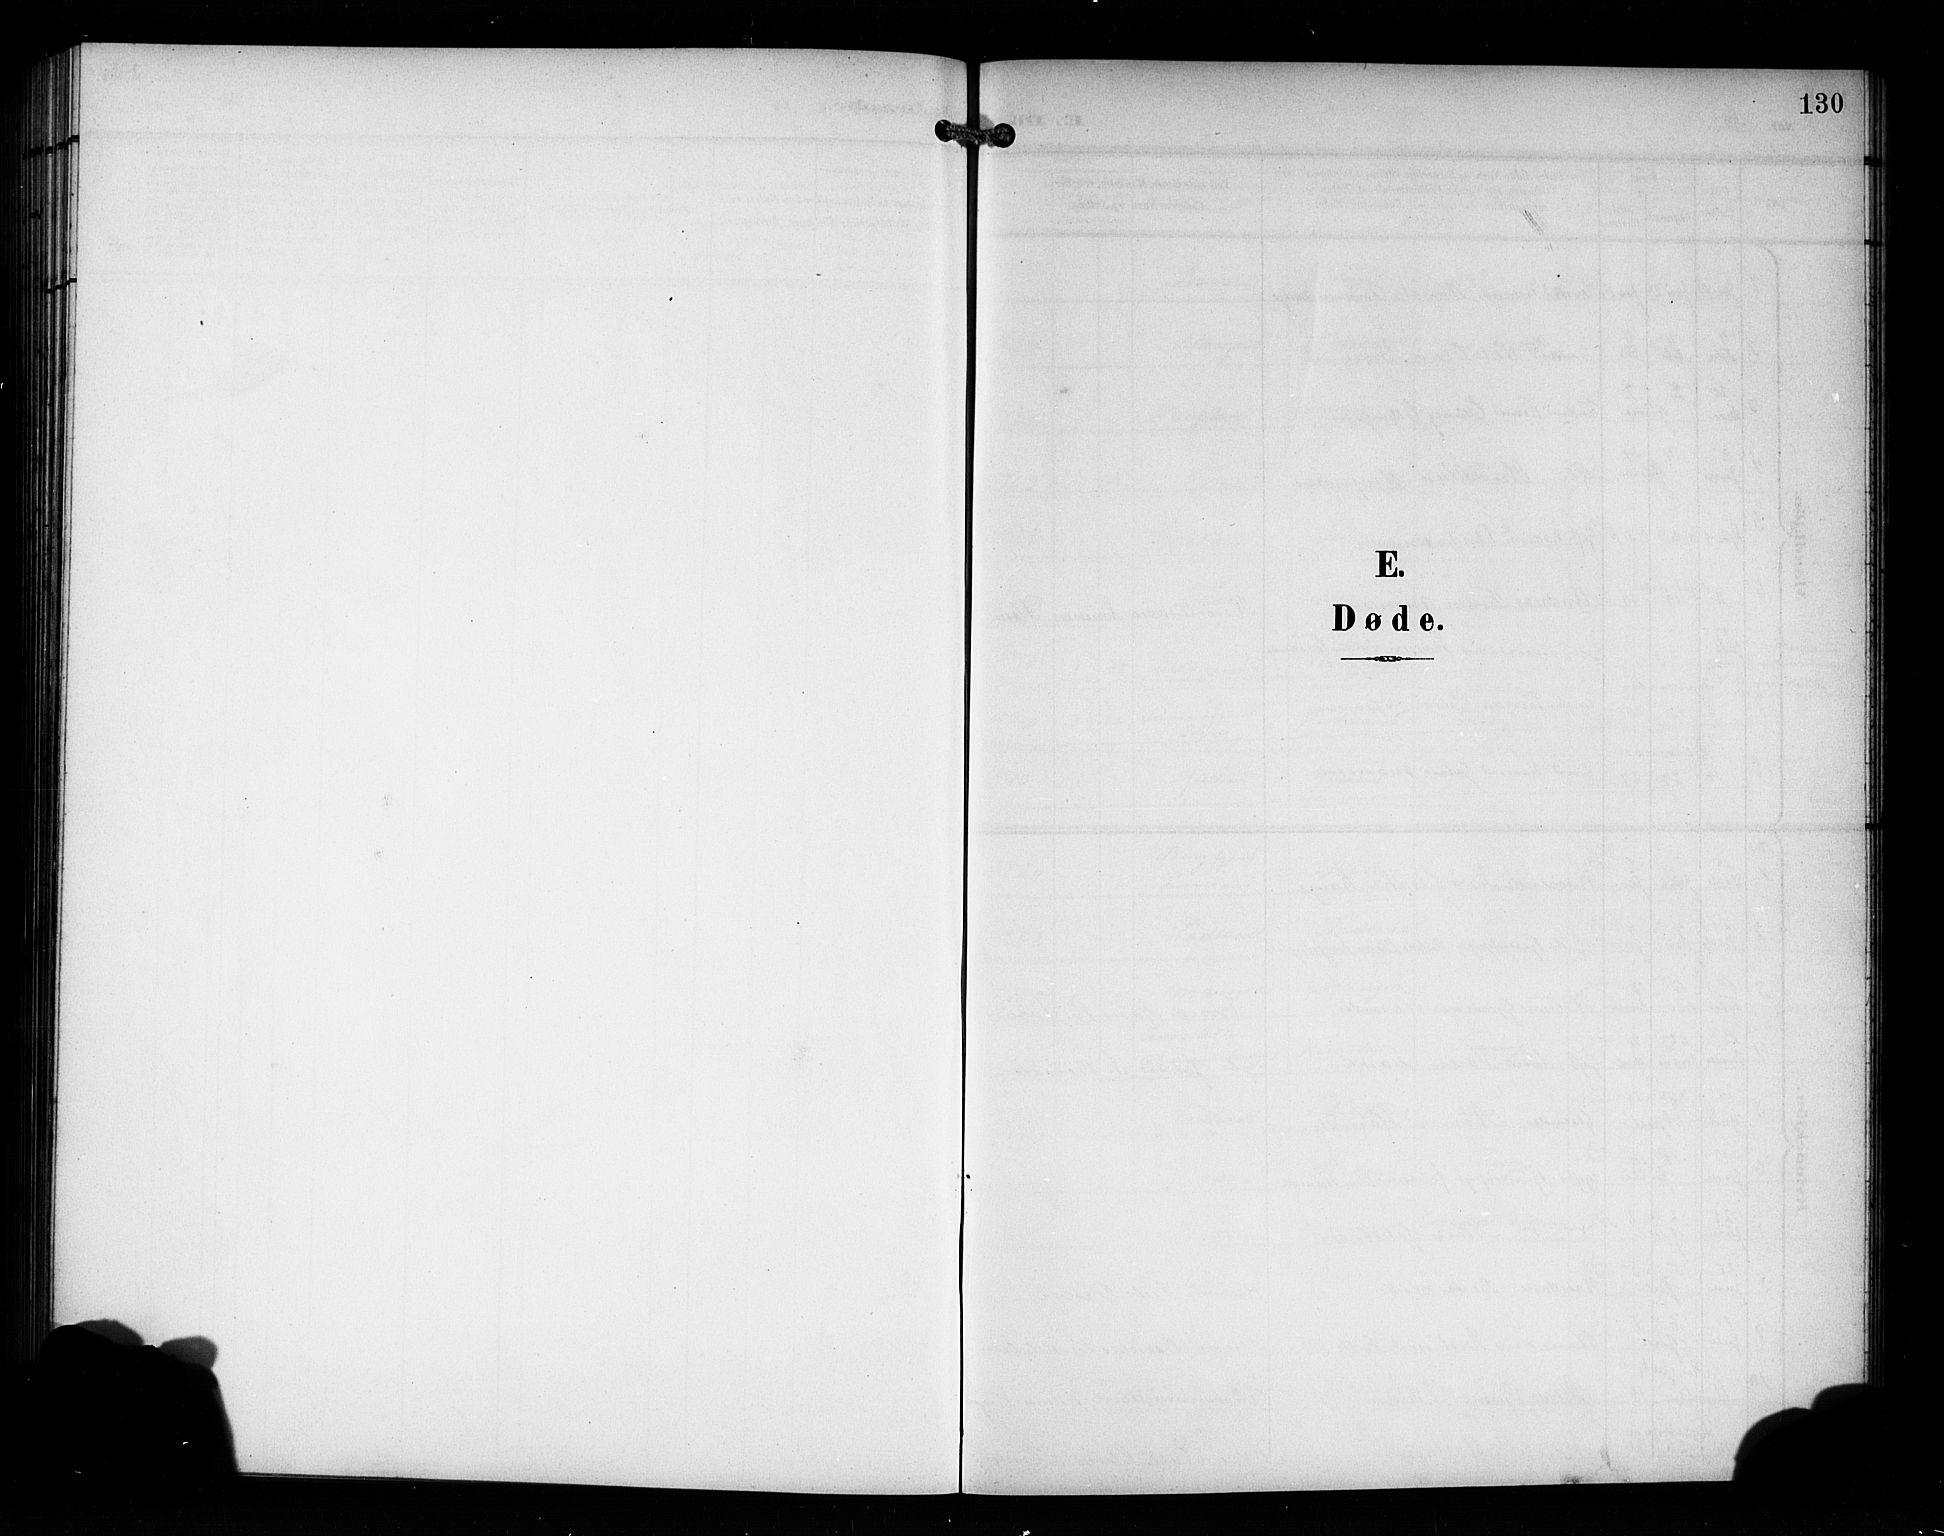 SAB, Manger sokneprestembete, H/Hab: Klokkerbok nr. A 2, 1902-1923, s. 130